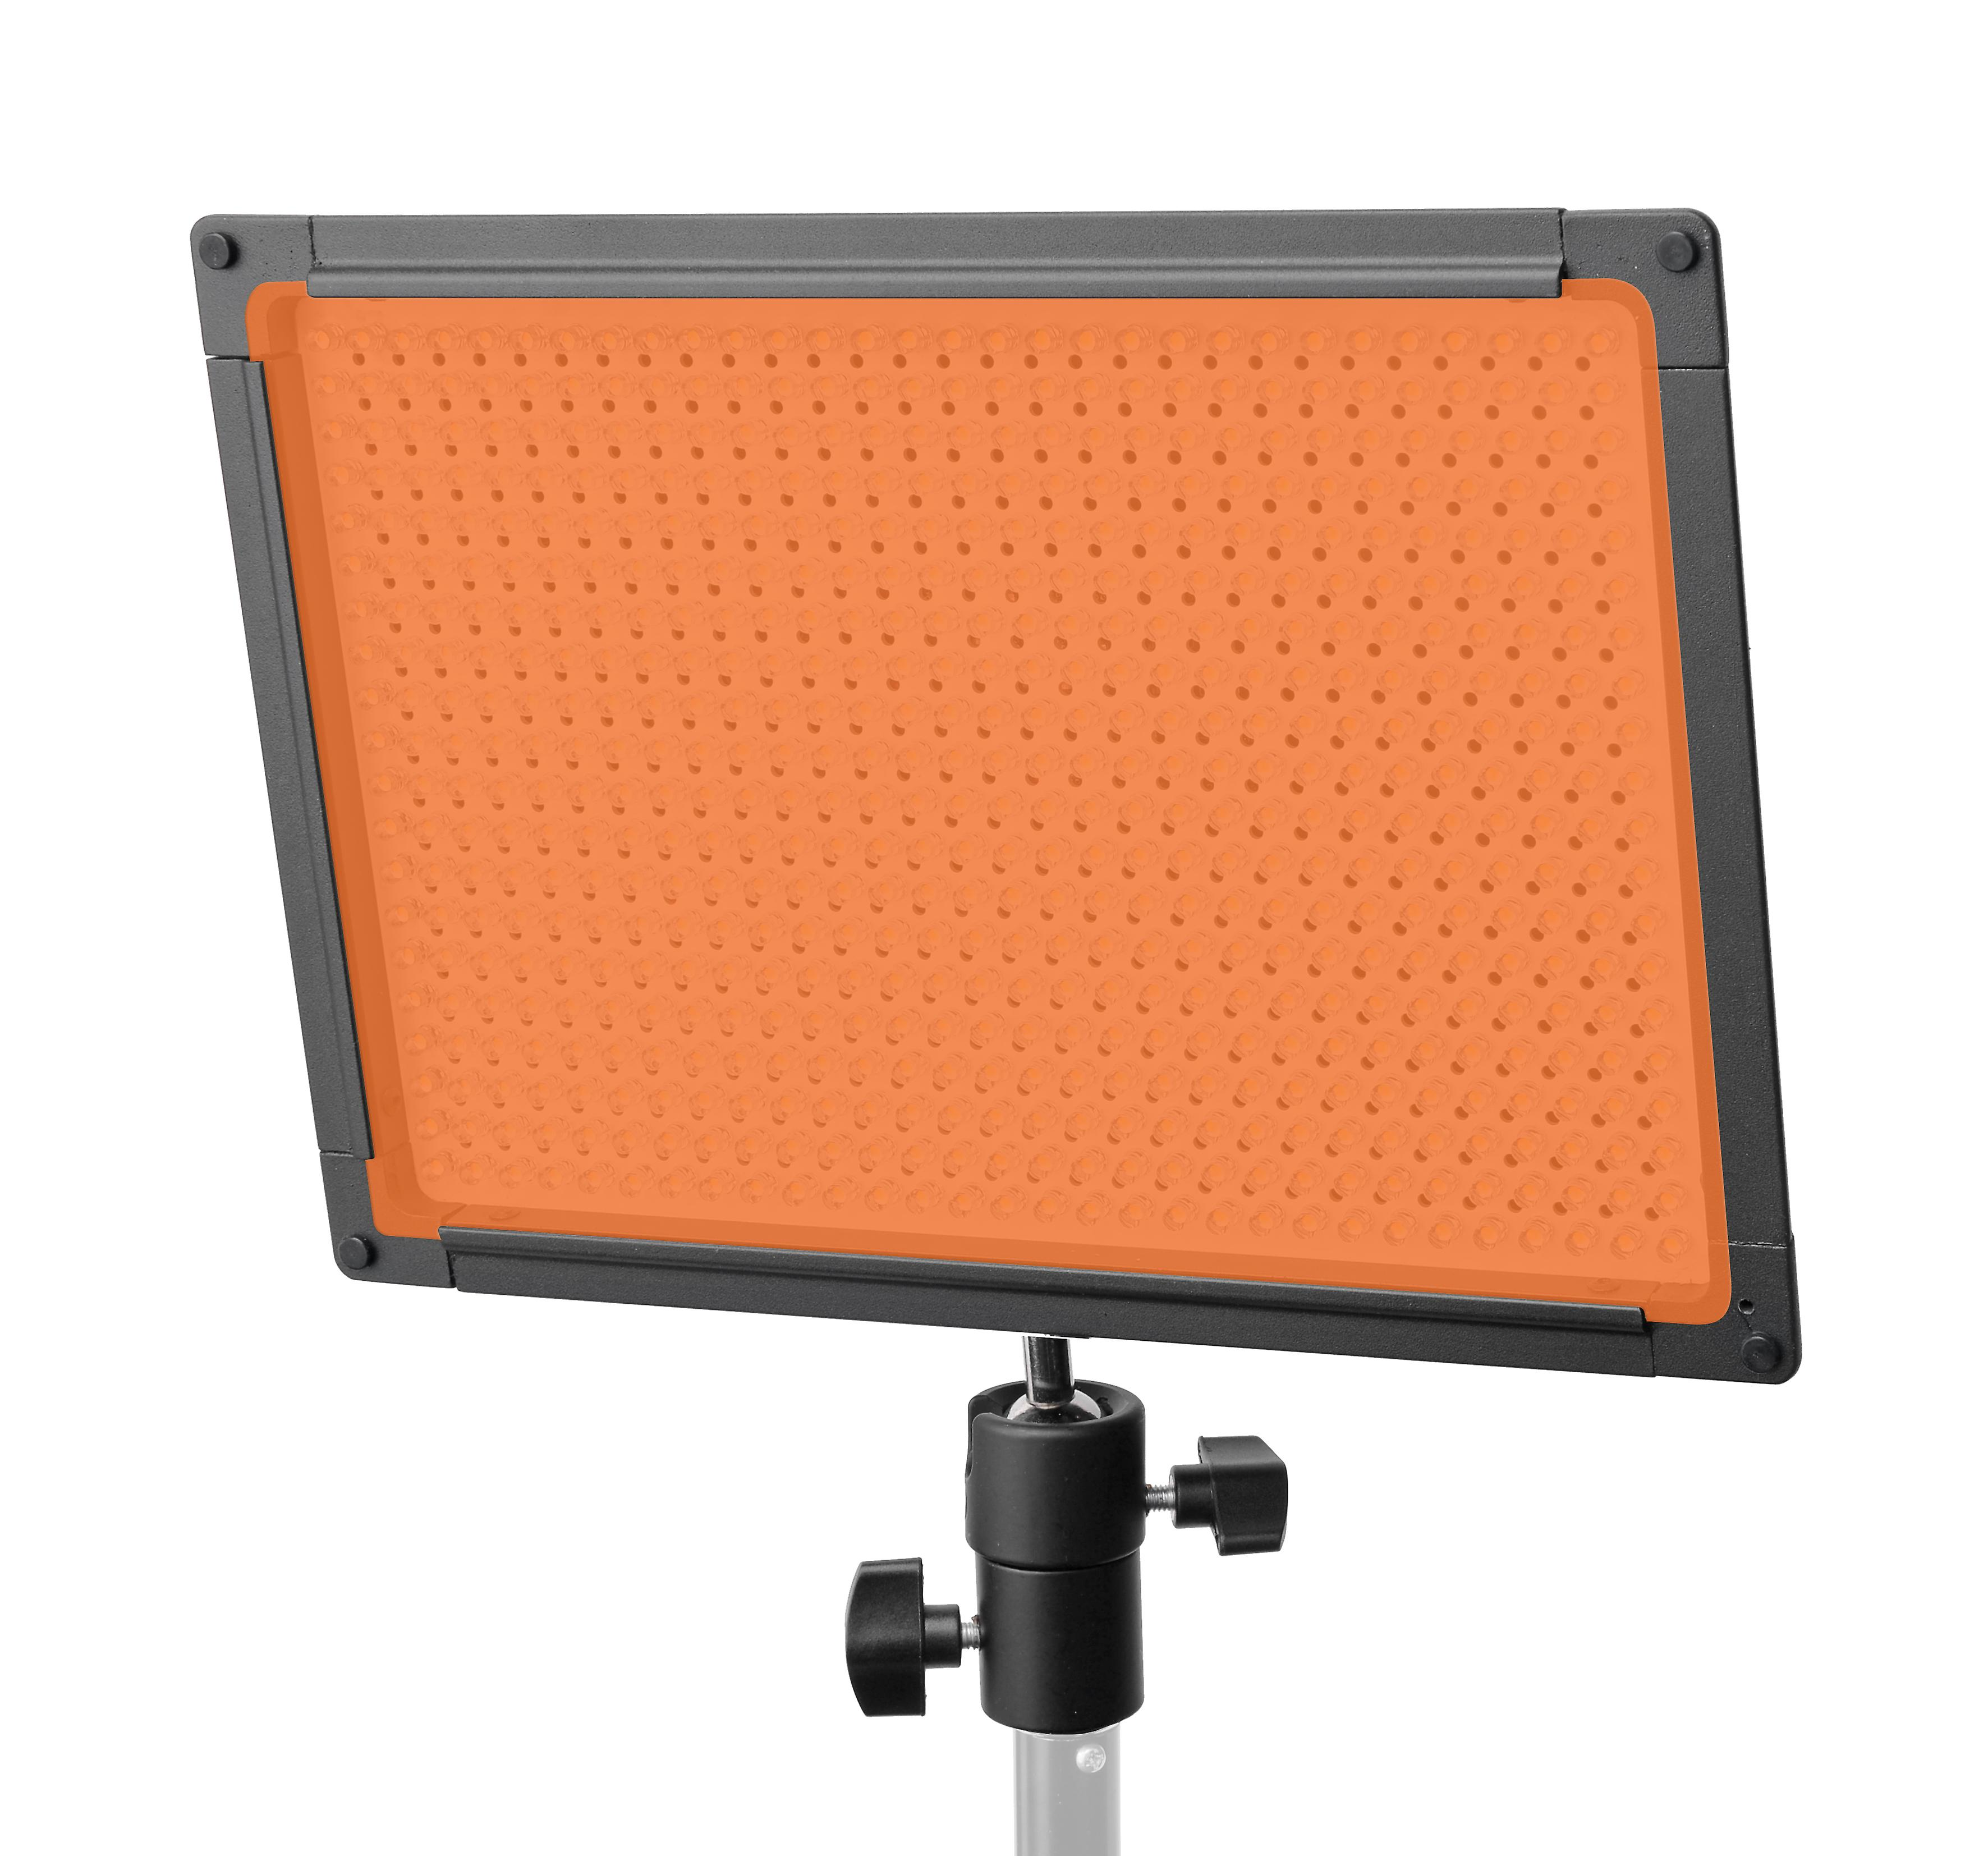 BRESSER SH-600 36W/5.600LUX Slimline LED Studiolampe